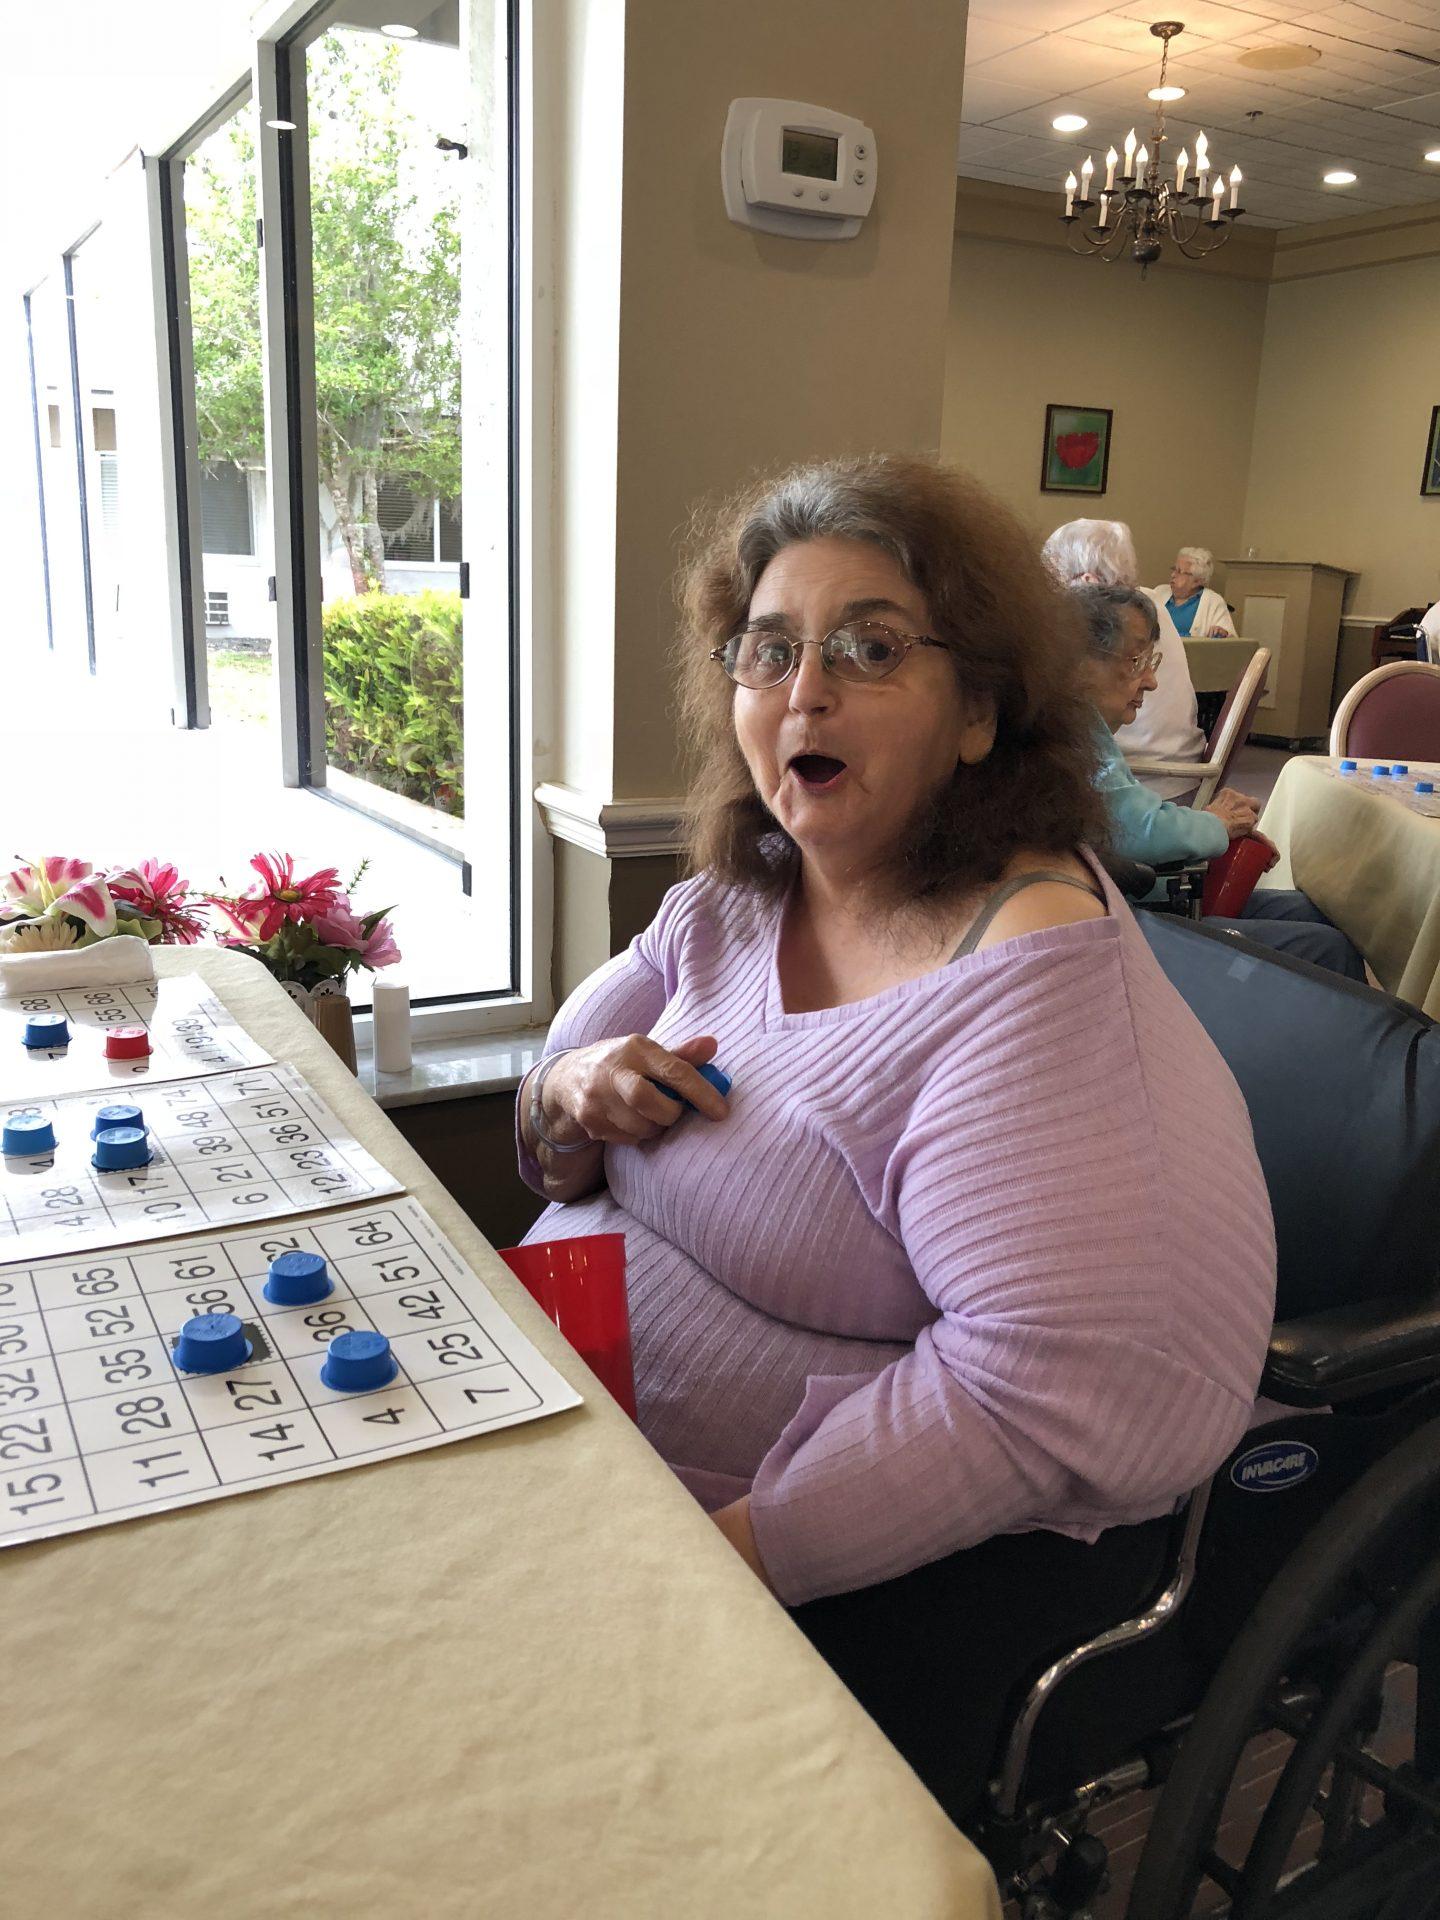 Mom sure loved her bingo.